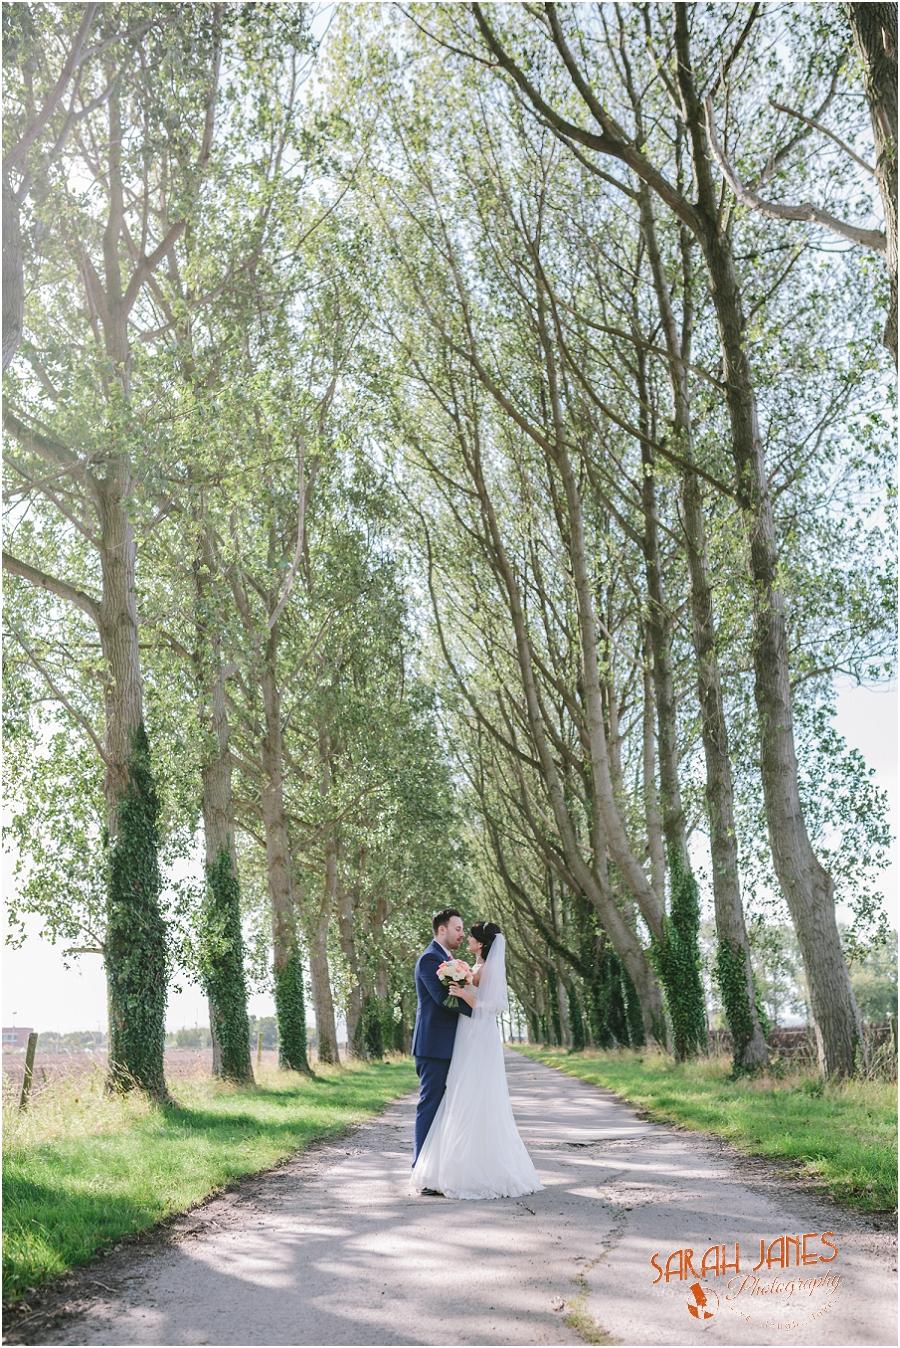 Oddfellows Wedding Photography, Quirky Wedding photography, Documentry Wedding Photography, Sarah Janes Photography,_0018.jpg